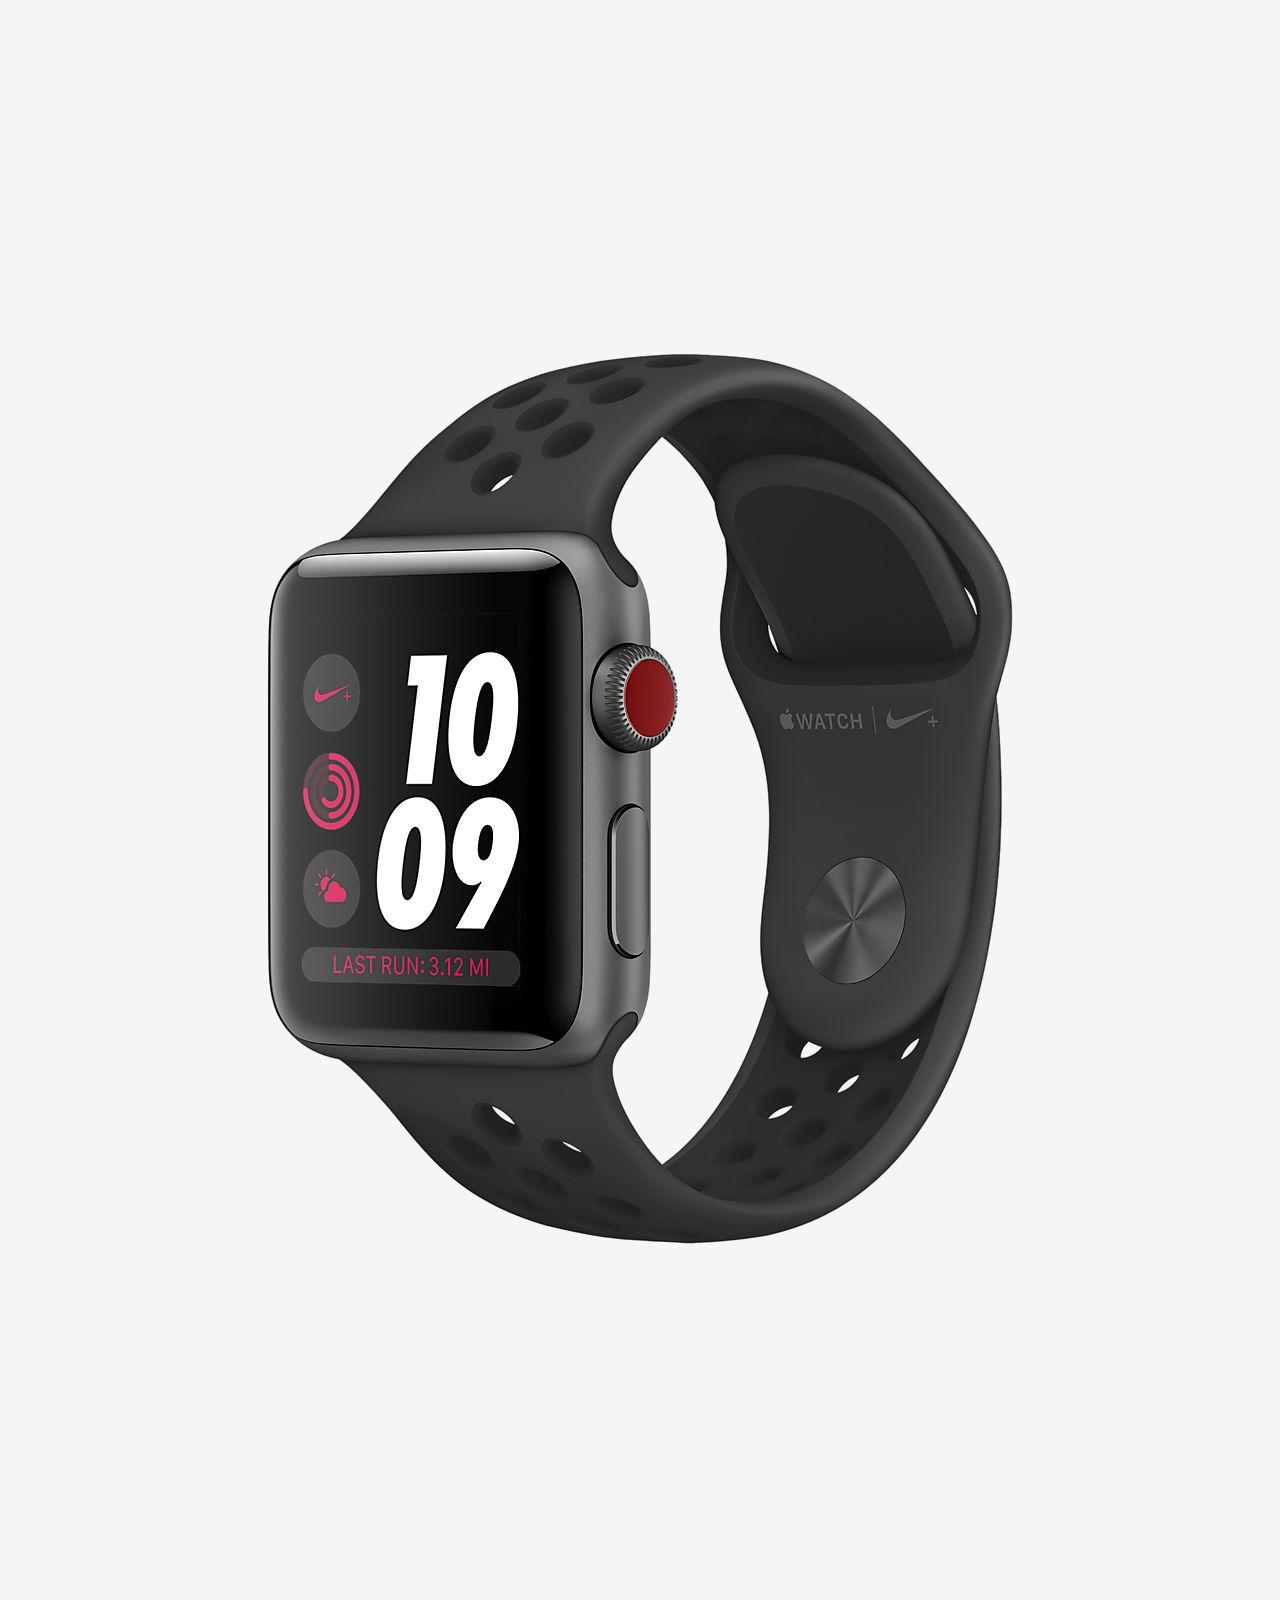 Apple Watch Nike Series 3 (GPS + Cellular) 38mm Running Watch